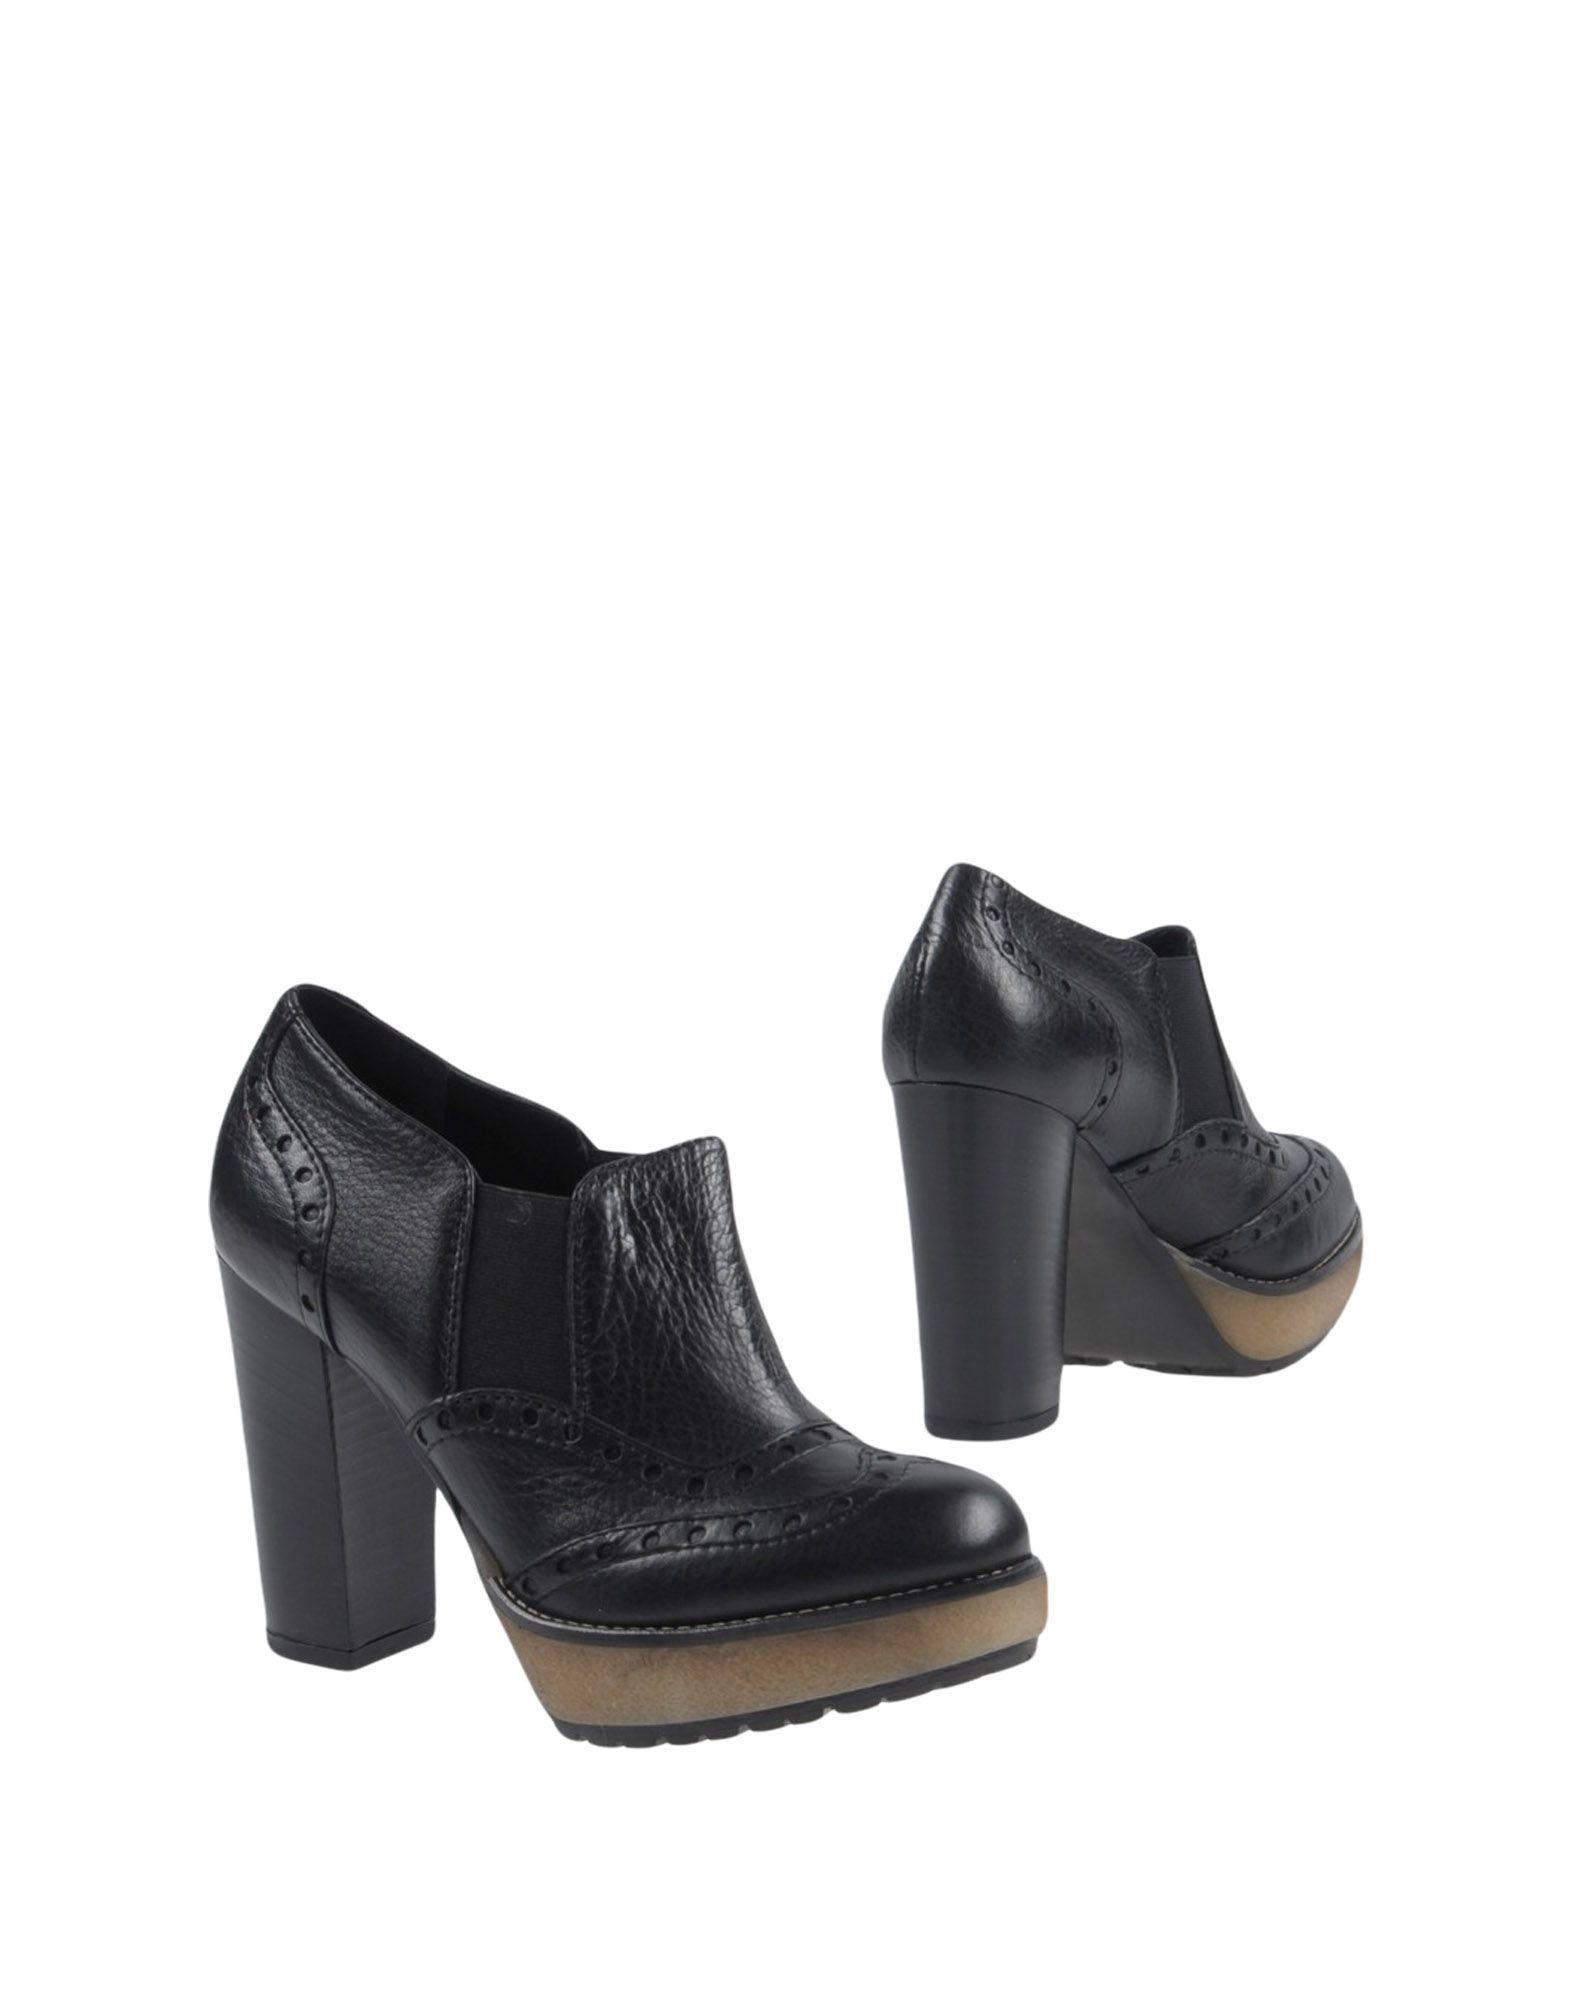 Emanuela Passeri Stiefelette Damen beliebte  11444401DC Gute Qualität beliebte Damen Schuhe 3e0de4